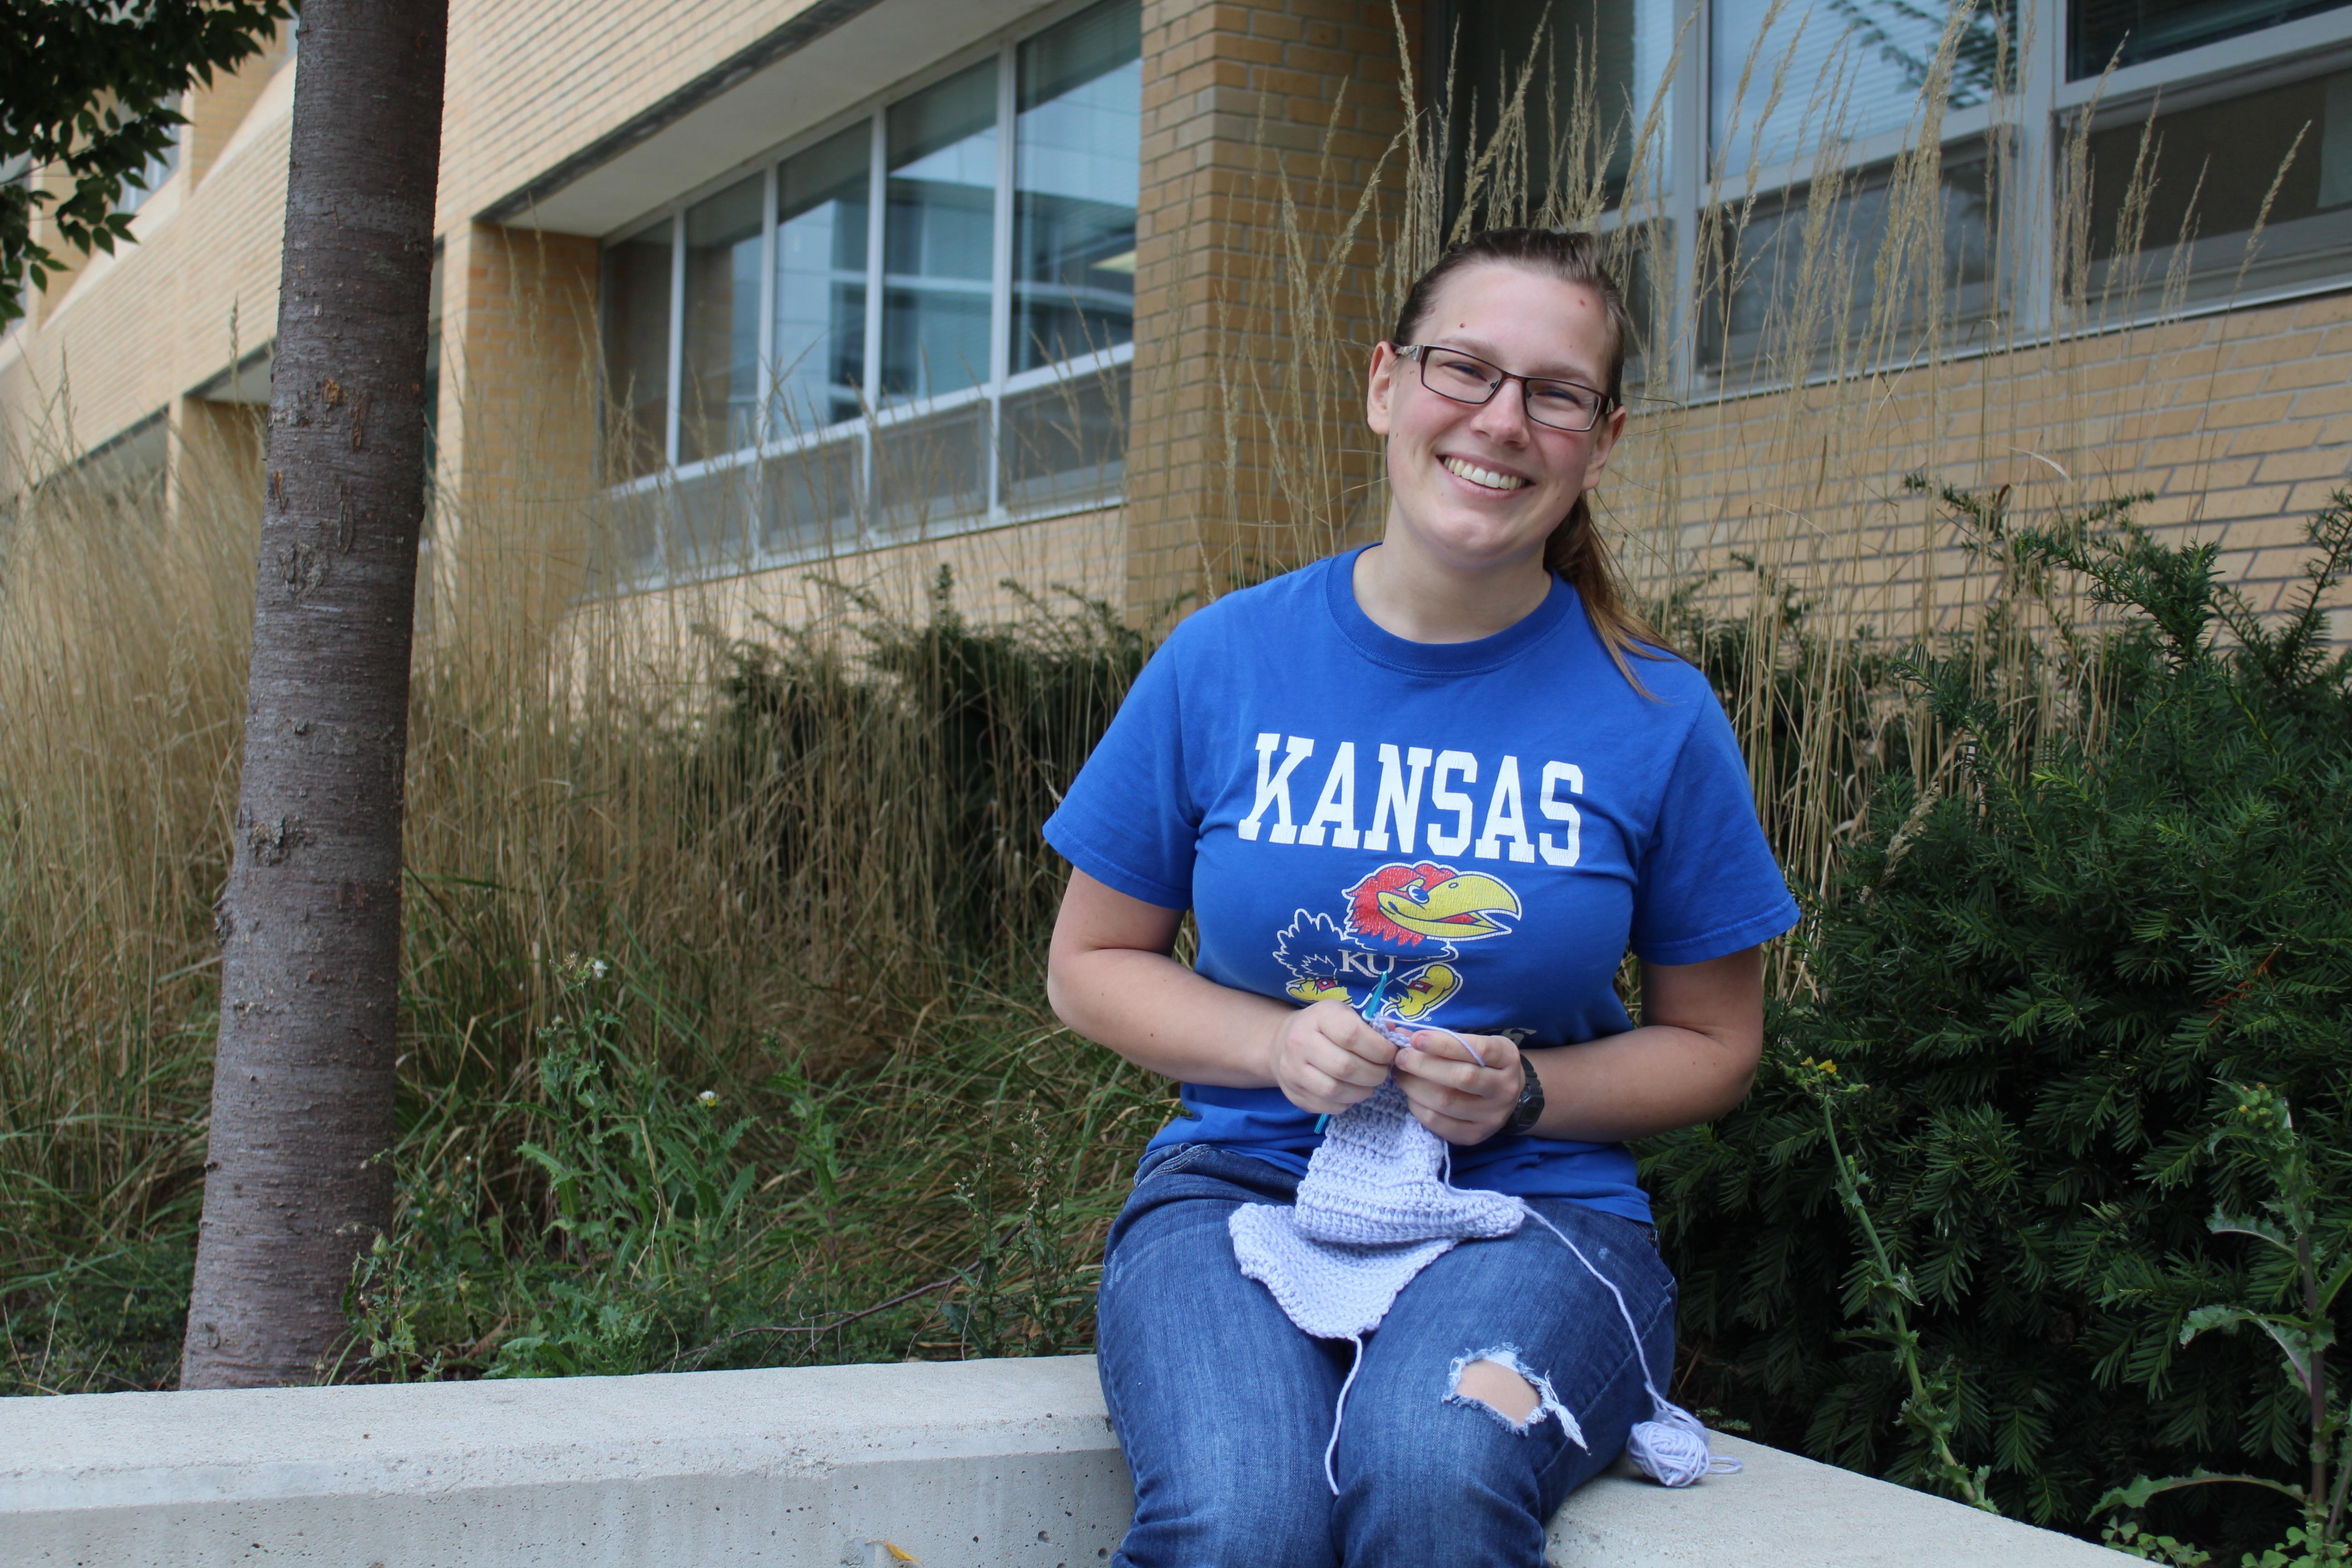 'Crochet Lady' more than her meme-moniker; she's a KU senior who hopes to become a nun